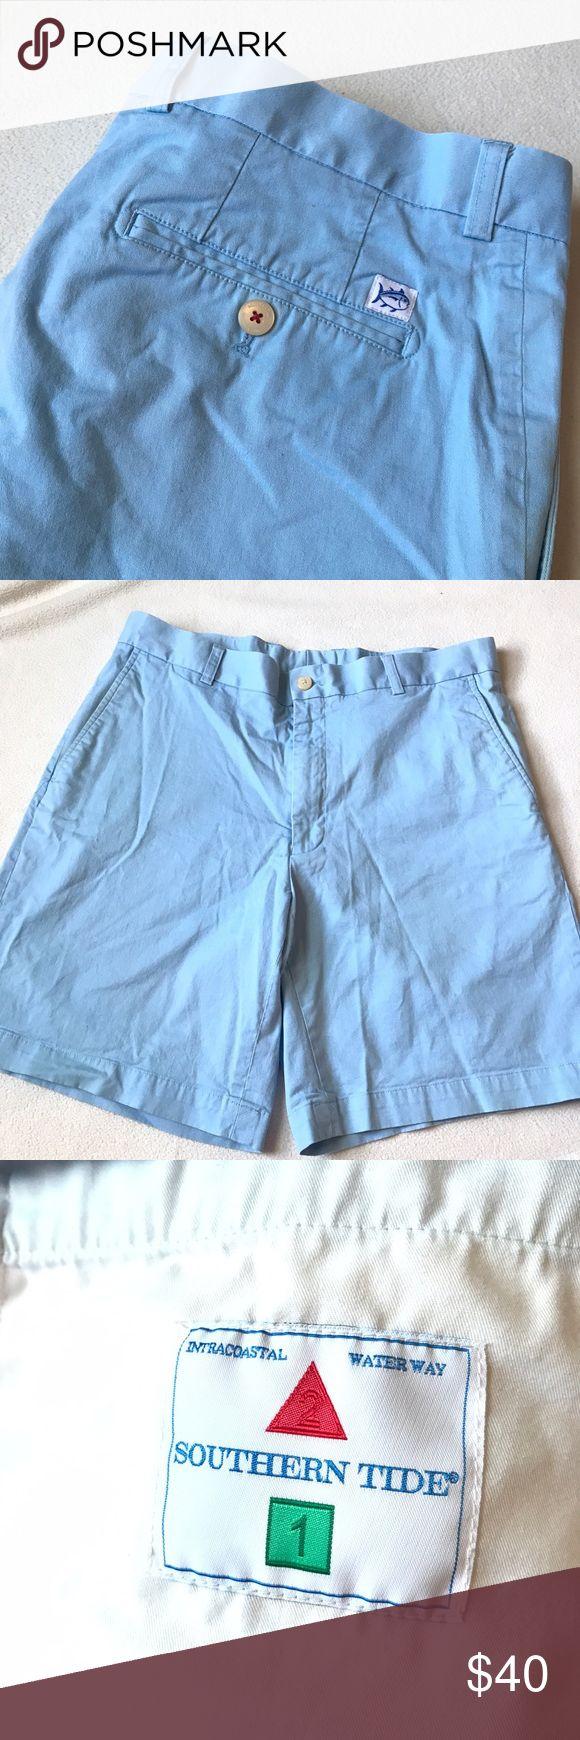 Southern Tide Light Blue Shorts Light blue Southern Tide shorts. Size 34. Great condition. Southern Tide Shorts